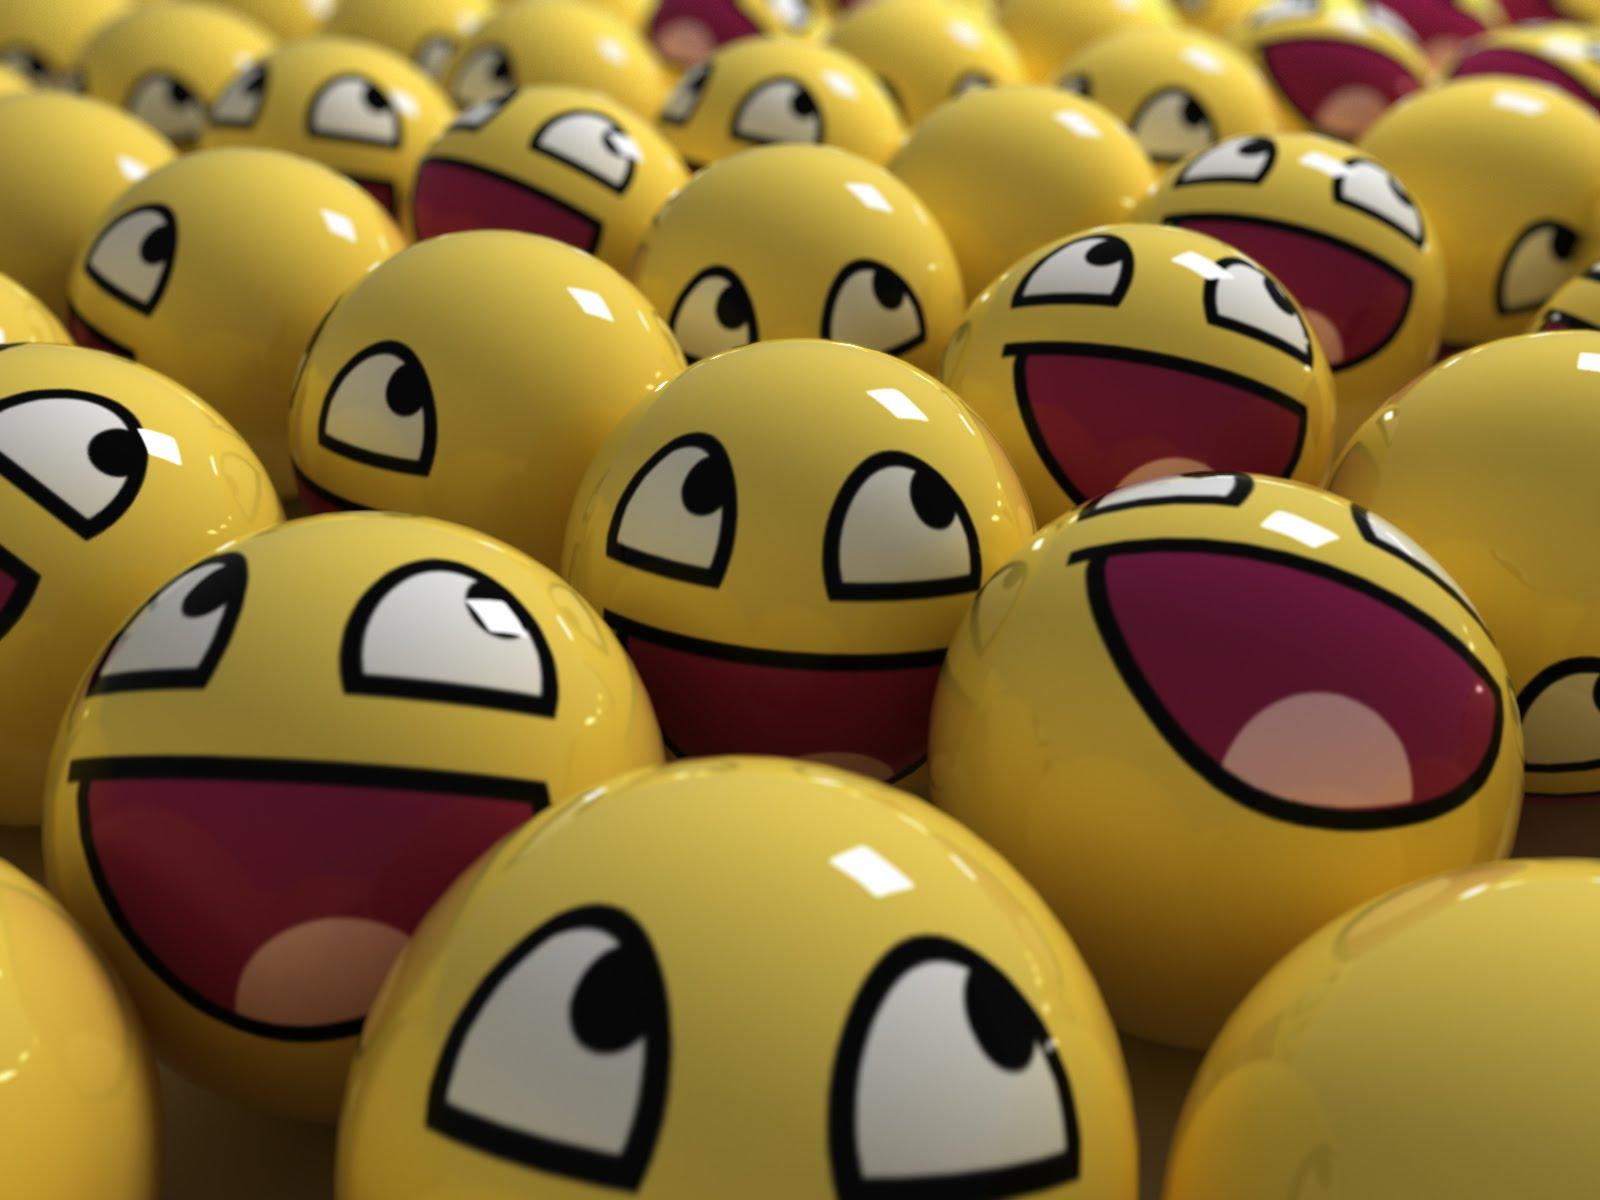 http://3.bp.blogspot.com/-bkfOMFh9OR8/TaxdyEls1WI/AAAAAAAAAEI/uCqIjgHd8mE/s1600/wallpaper-4chan.jpg